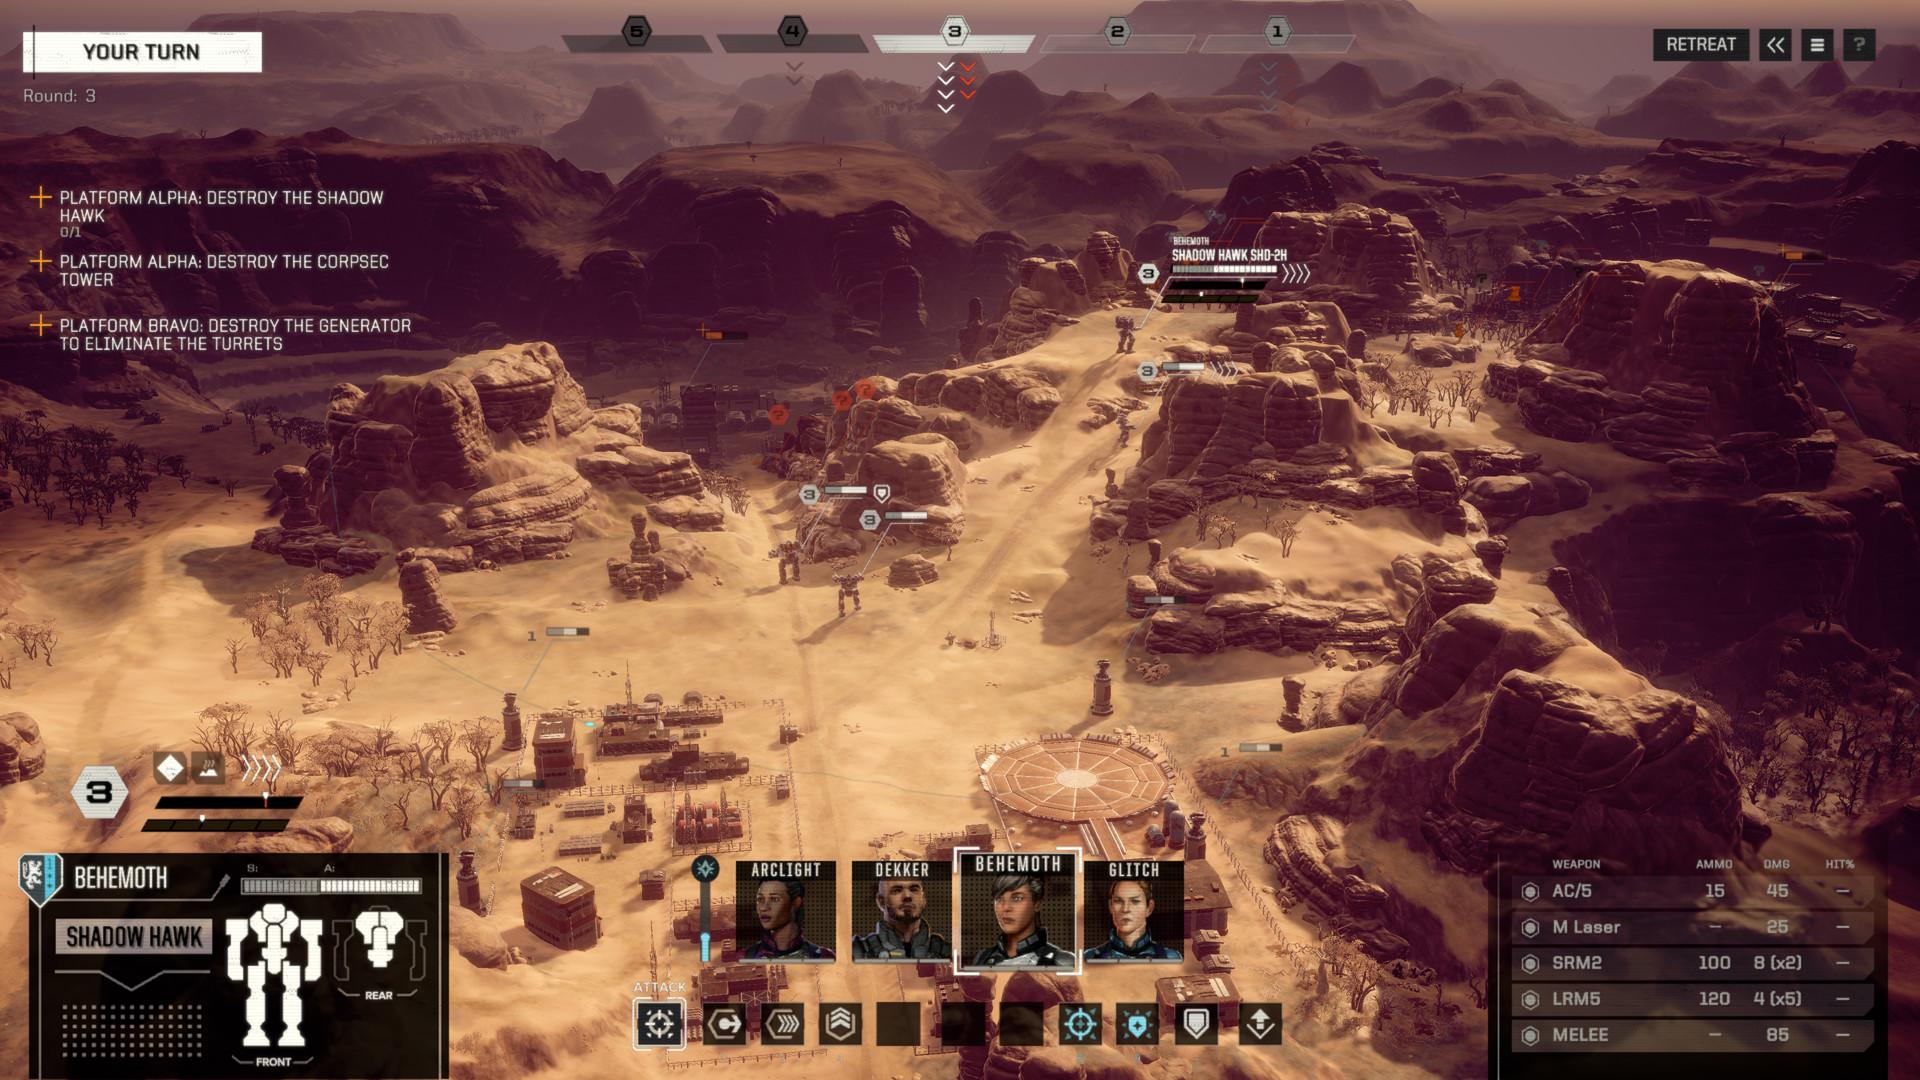 BattleTech: Digital Deluxe Edition [1.6.0-539R + DLCs] (2018/PC/Русский), Лицензия